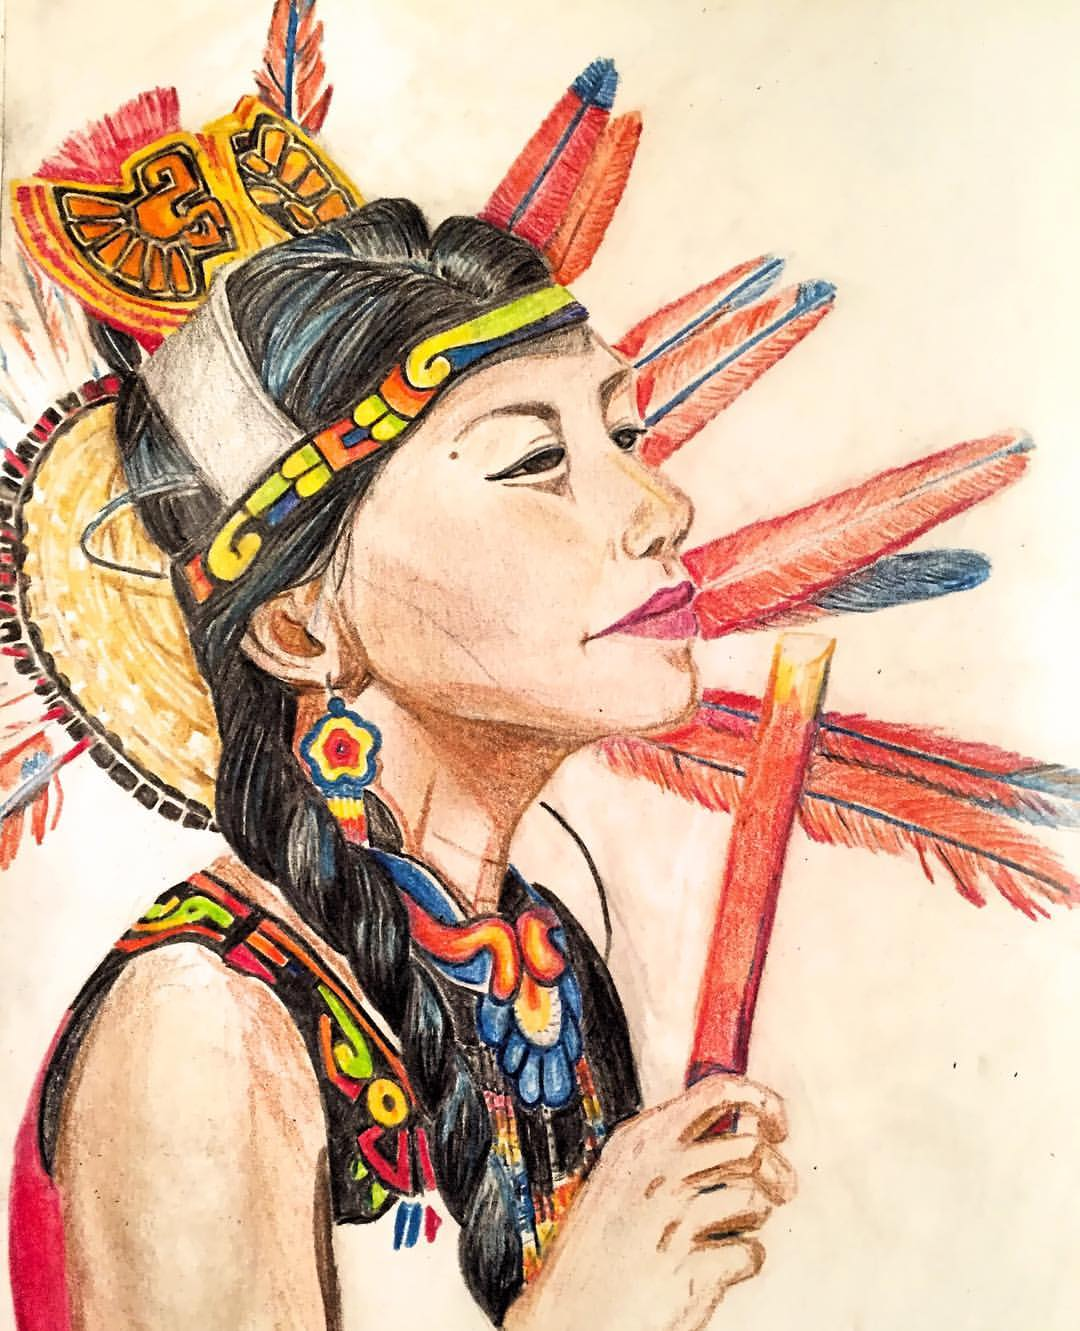 colored pencils in sketchbook, 2016